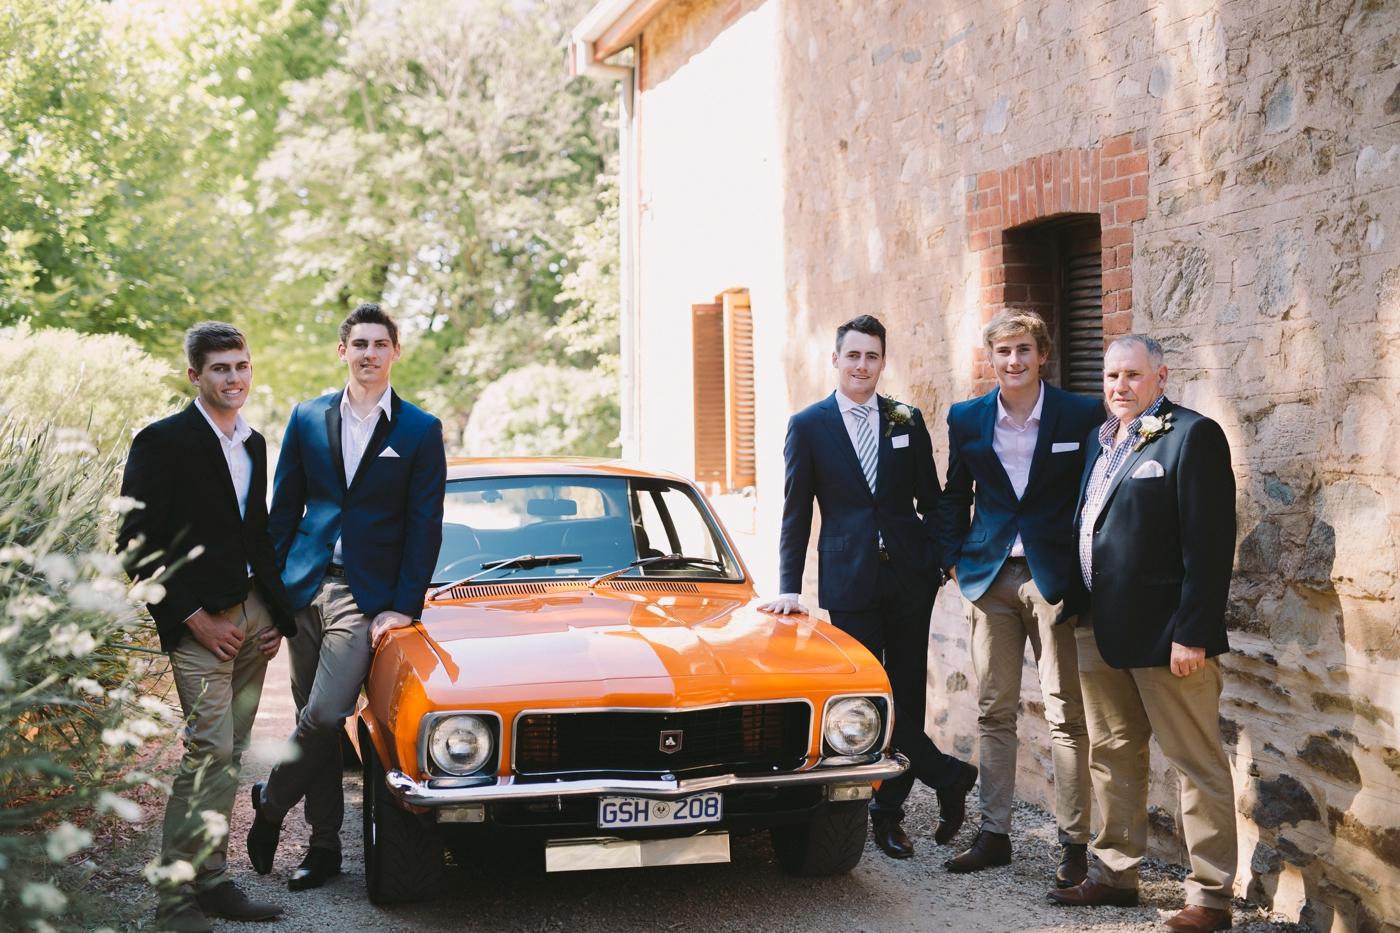 Lauren & Max - Marybank Estate Wedding - Natural wedding photographer in Adelaide - www.katherineschultzphotography.com 54